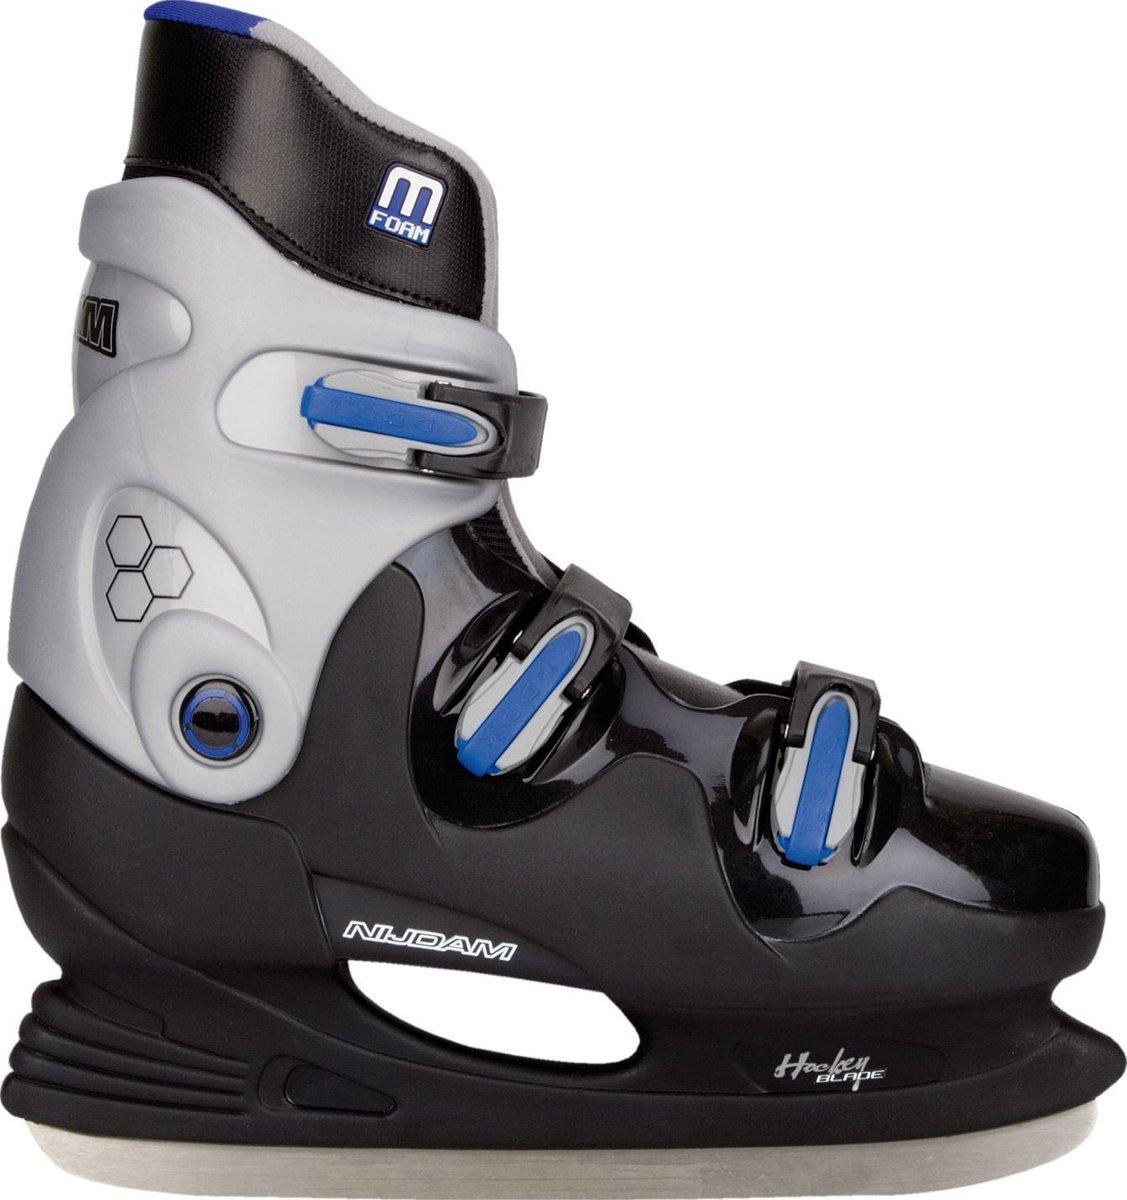 Nijdam IJshockeyschaats - Hardboot - Zwart/Blauw - Maat 44